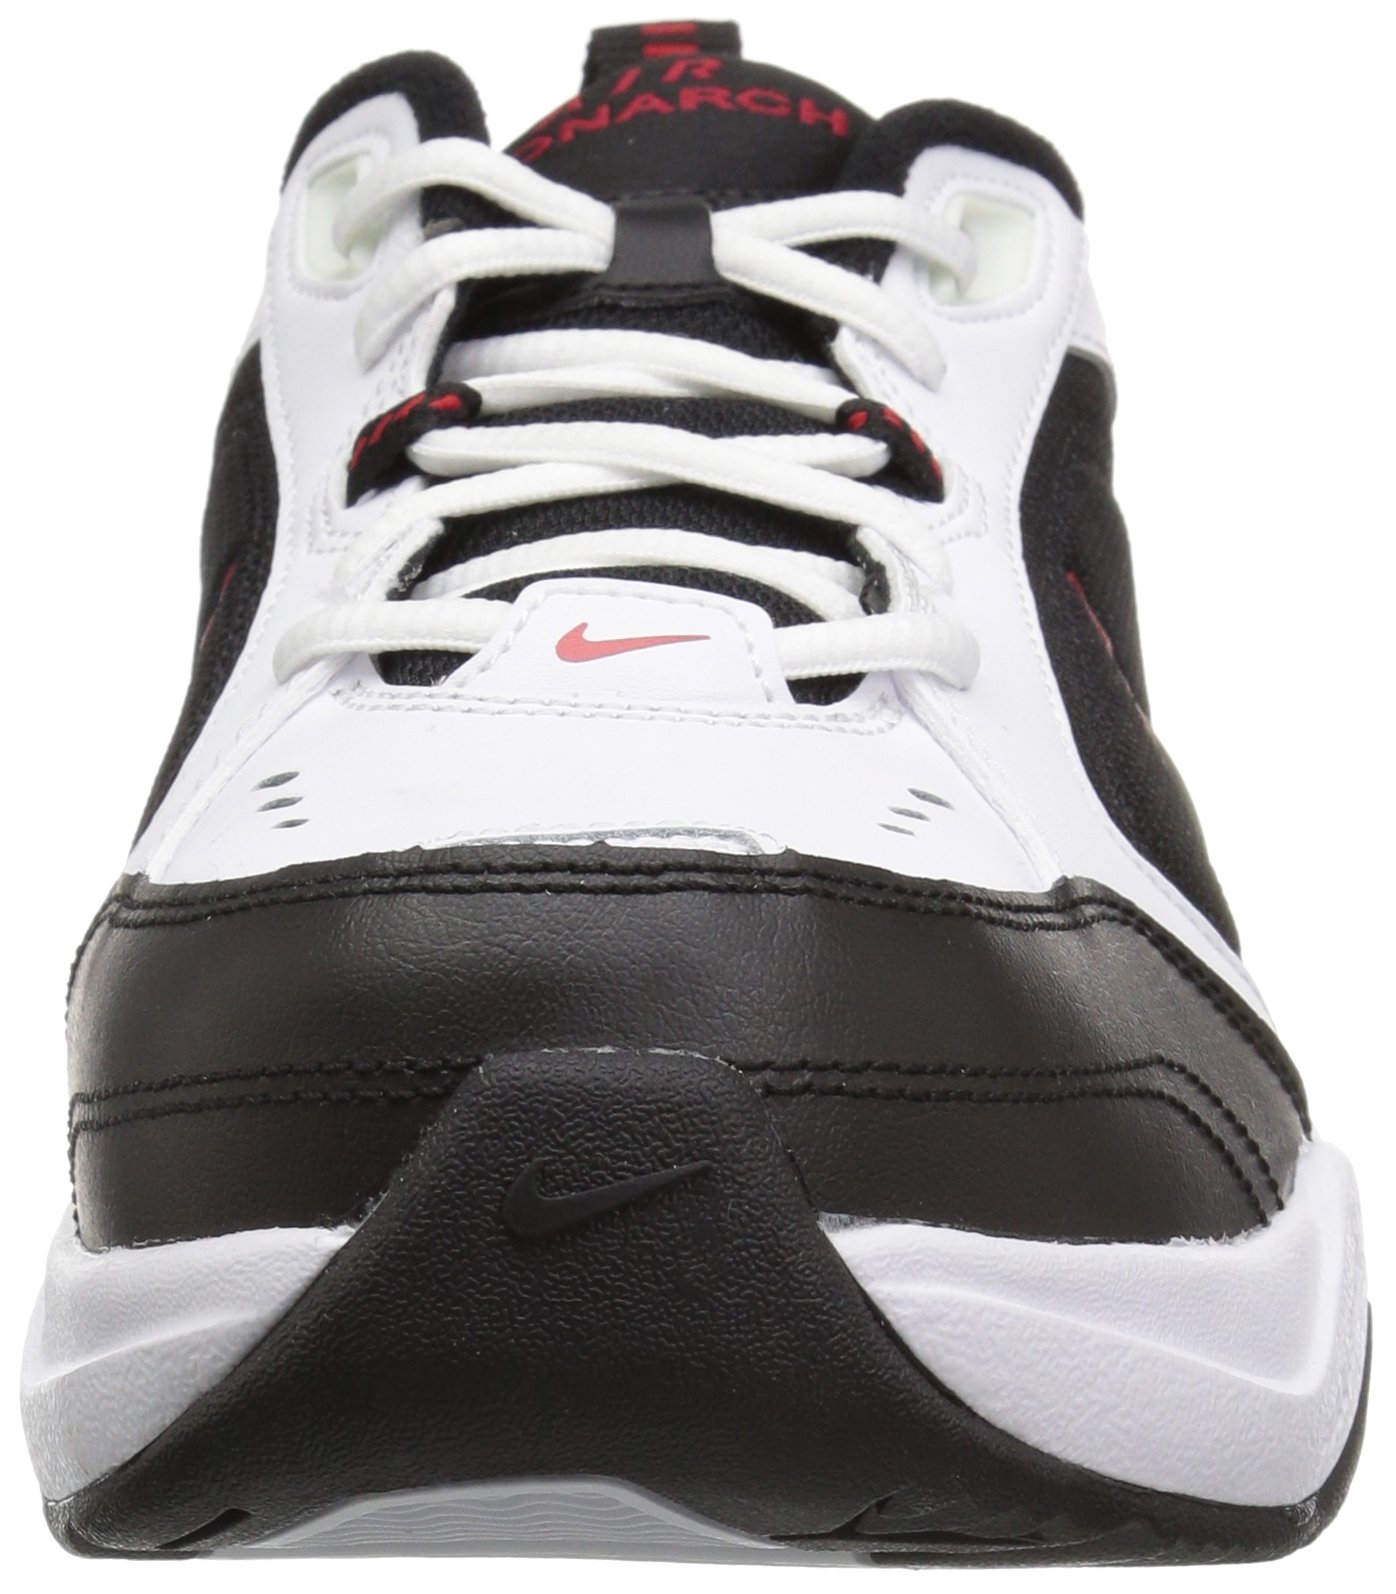 Nike Men's Air Monarch IV Cross Trainer, White/Black, 6.0 Regular US by Nike (Image #4)